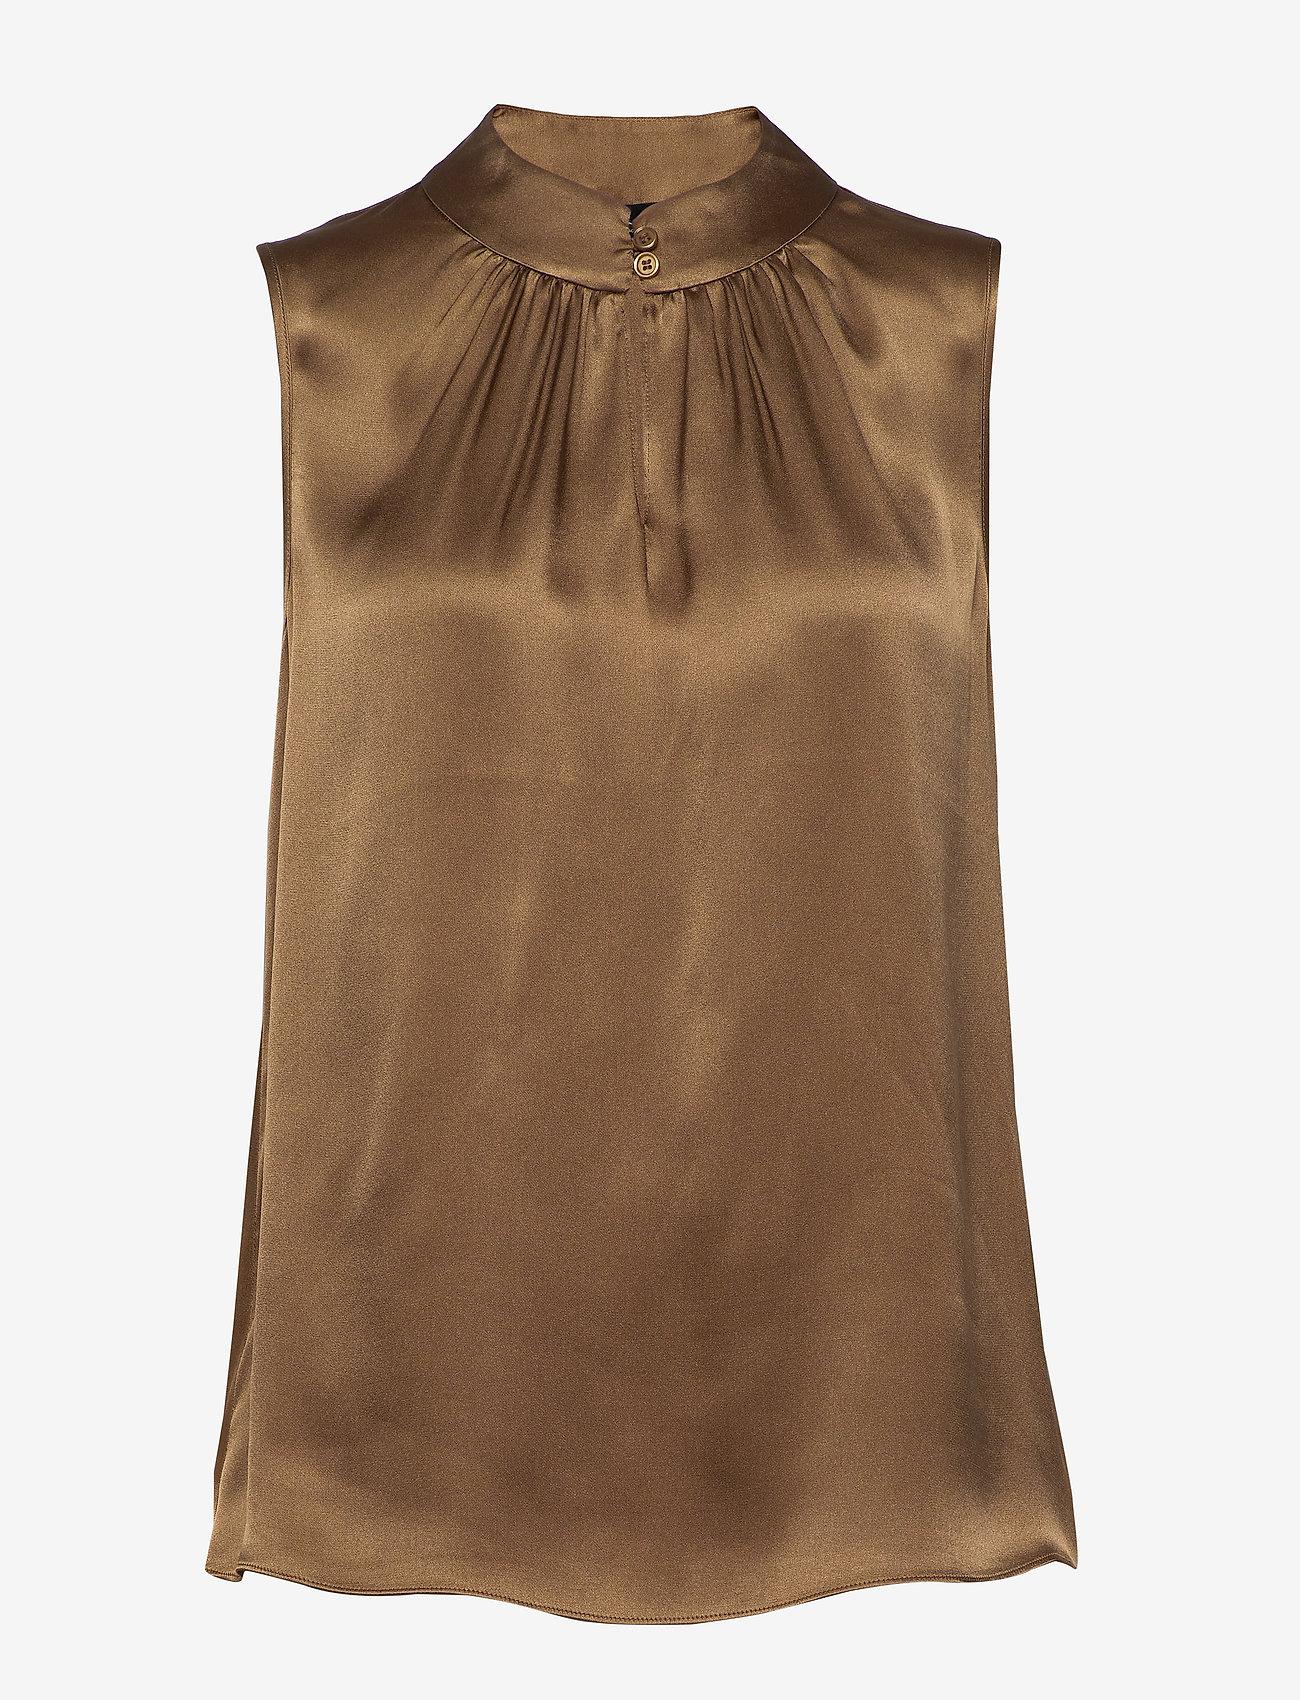 SAND - Double Silk - Prosi Top - blouses zonder mouwen - light camel - 0